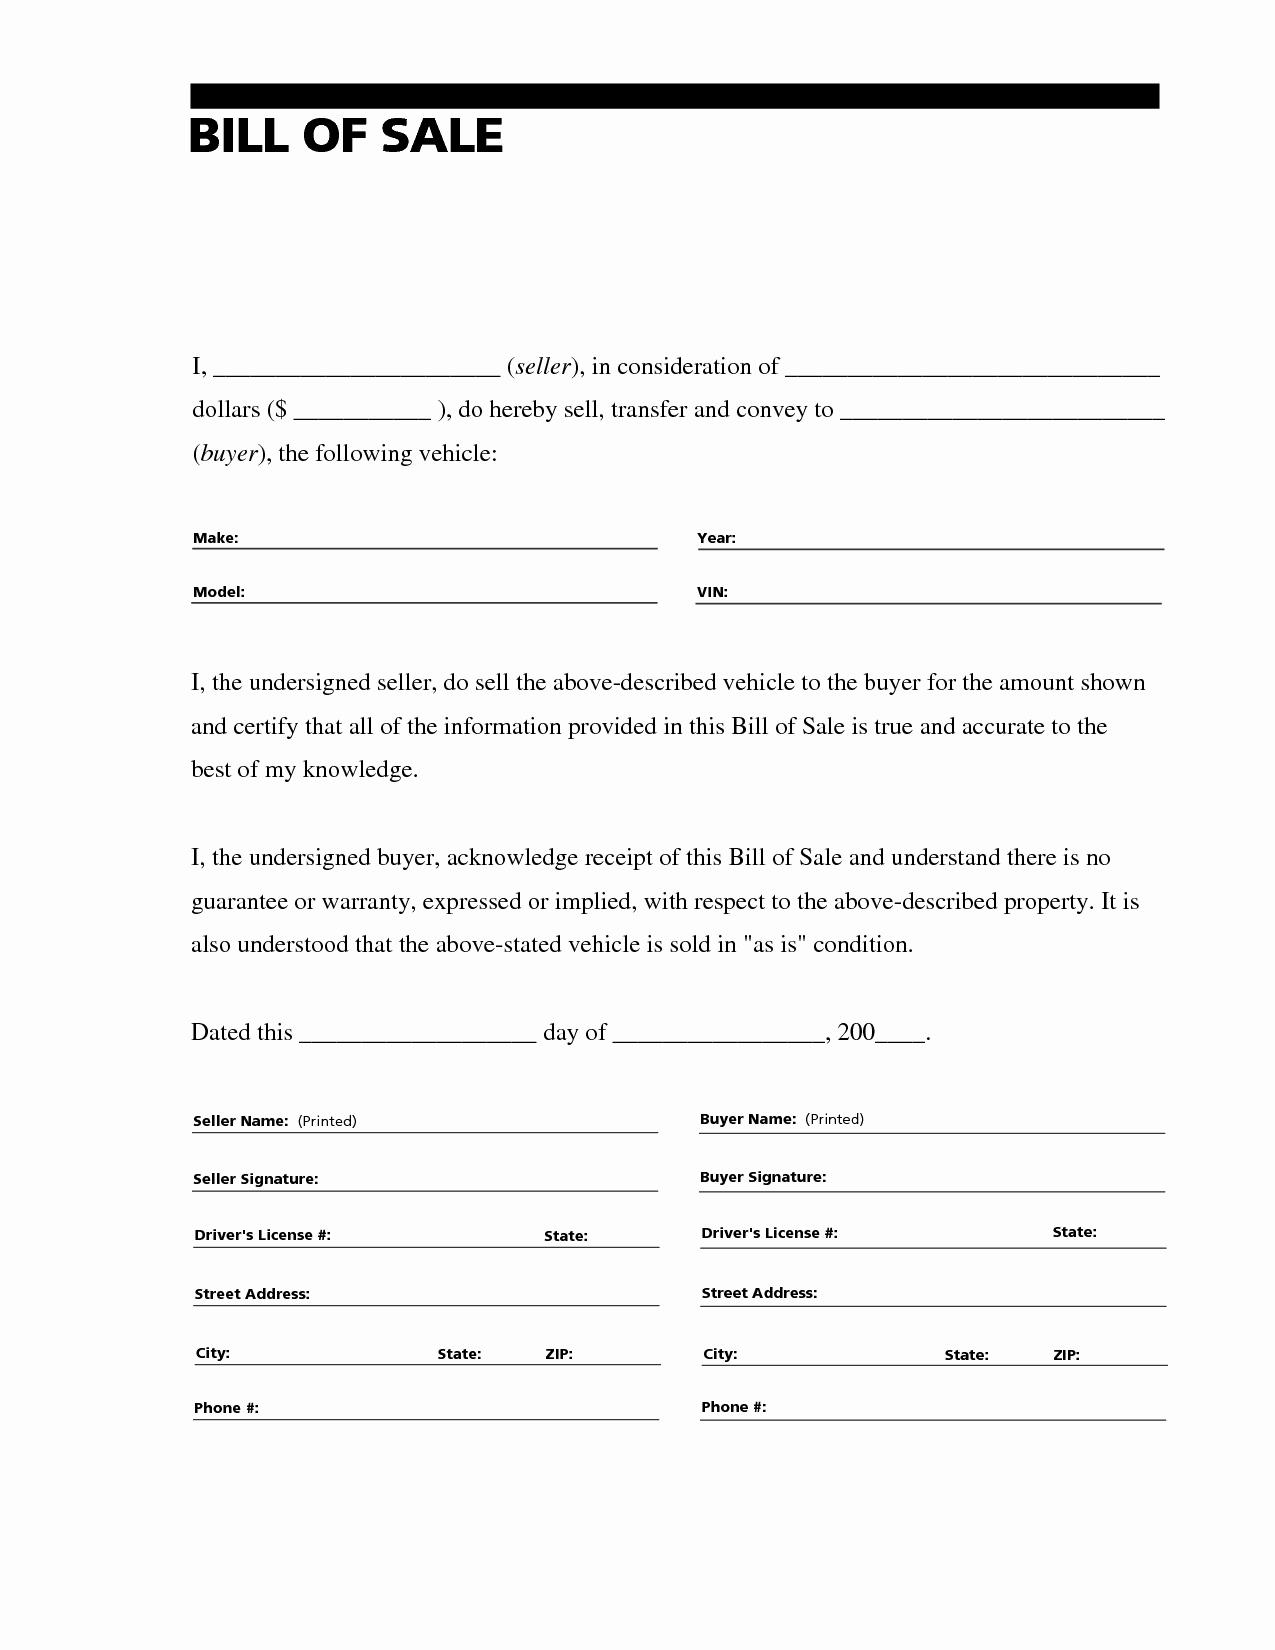 Sample Bill Of Sale Automobile Fresh Printable Sample Free Car Bill Of Sale Template form